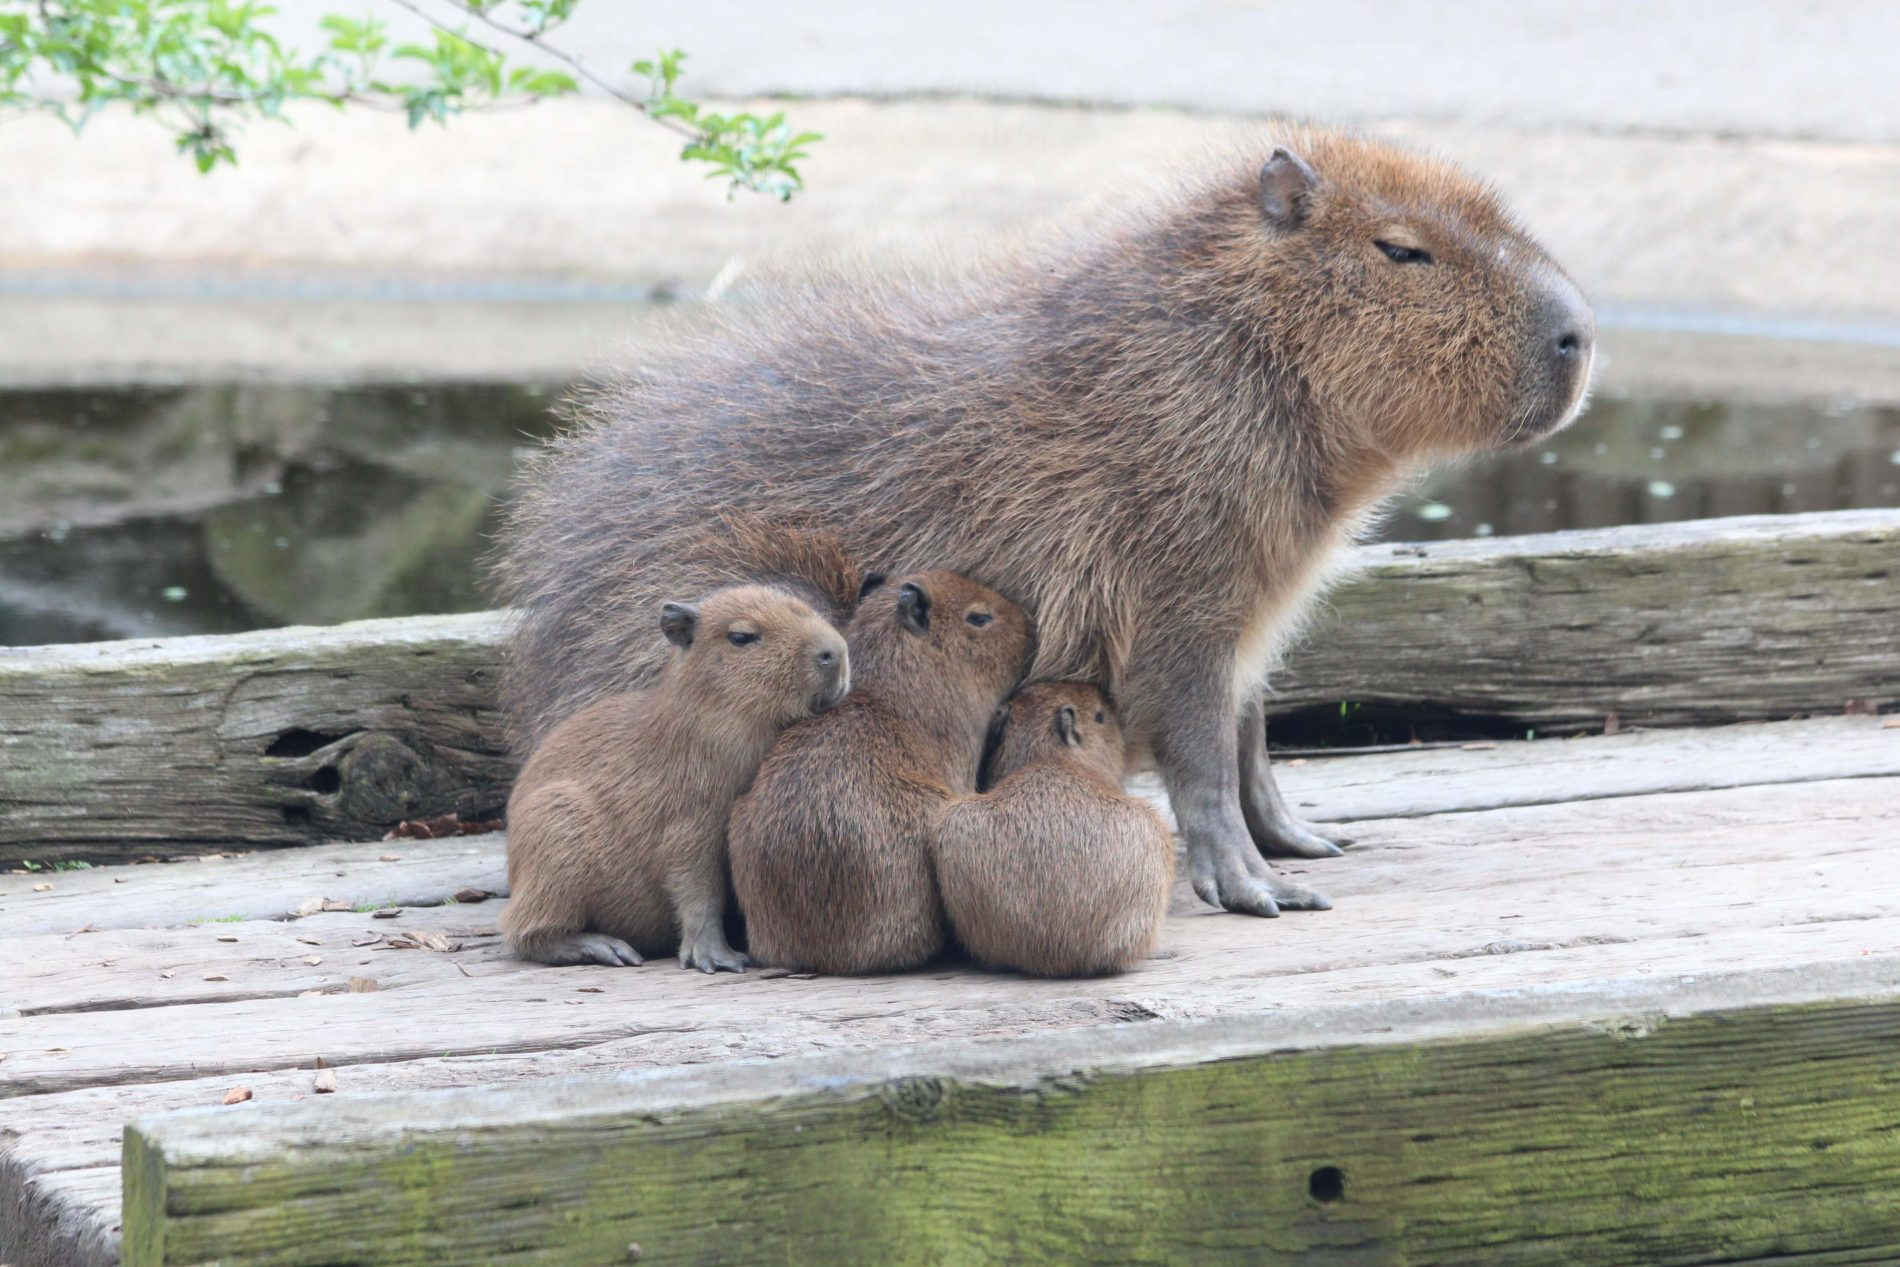 http://londonmumsmagazine.com/wp-content/uploads/2012/04/Chessington-Capybara-04.jpg